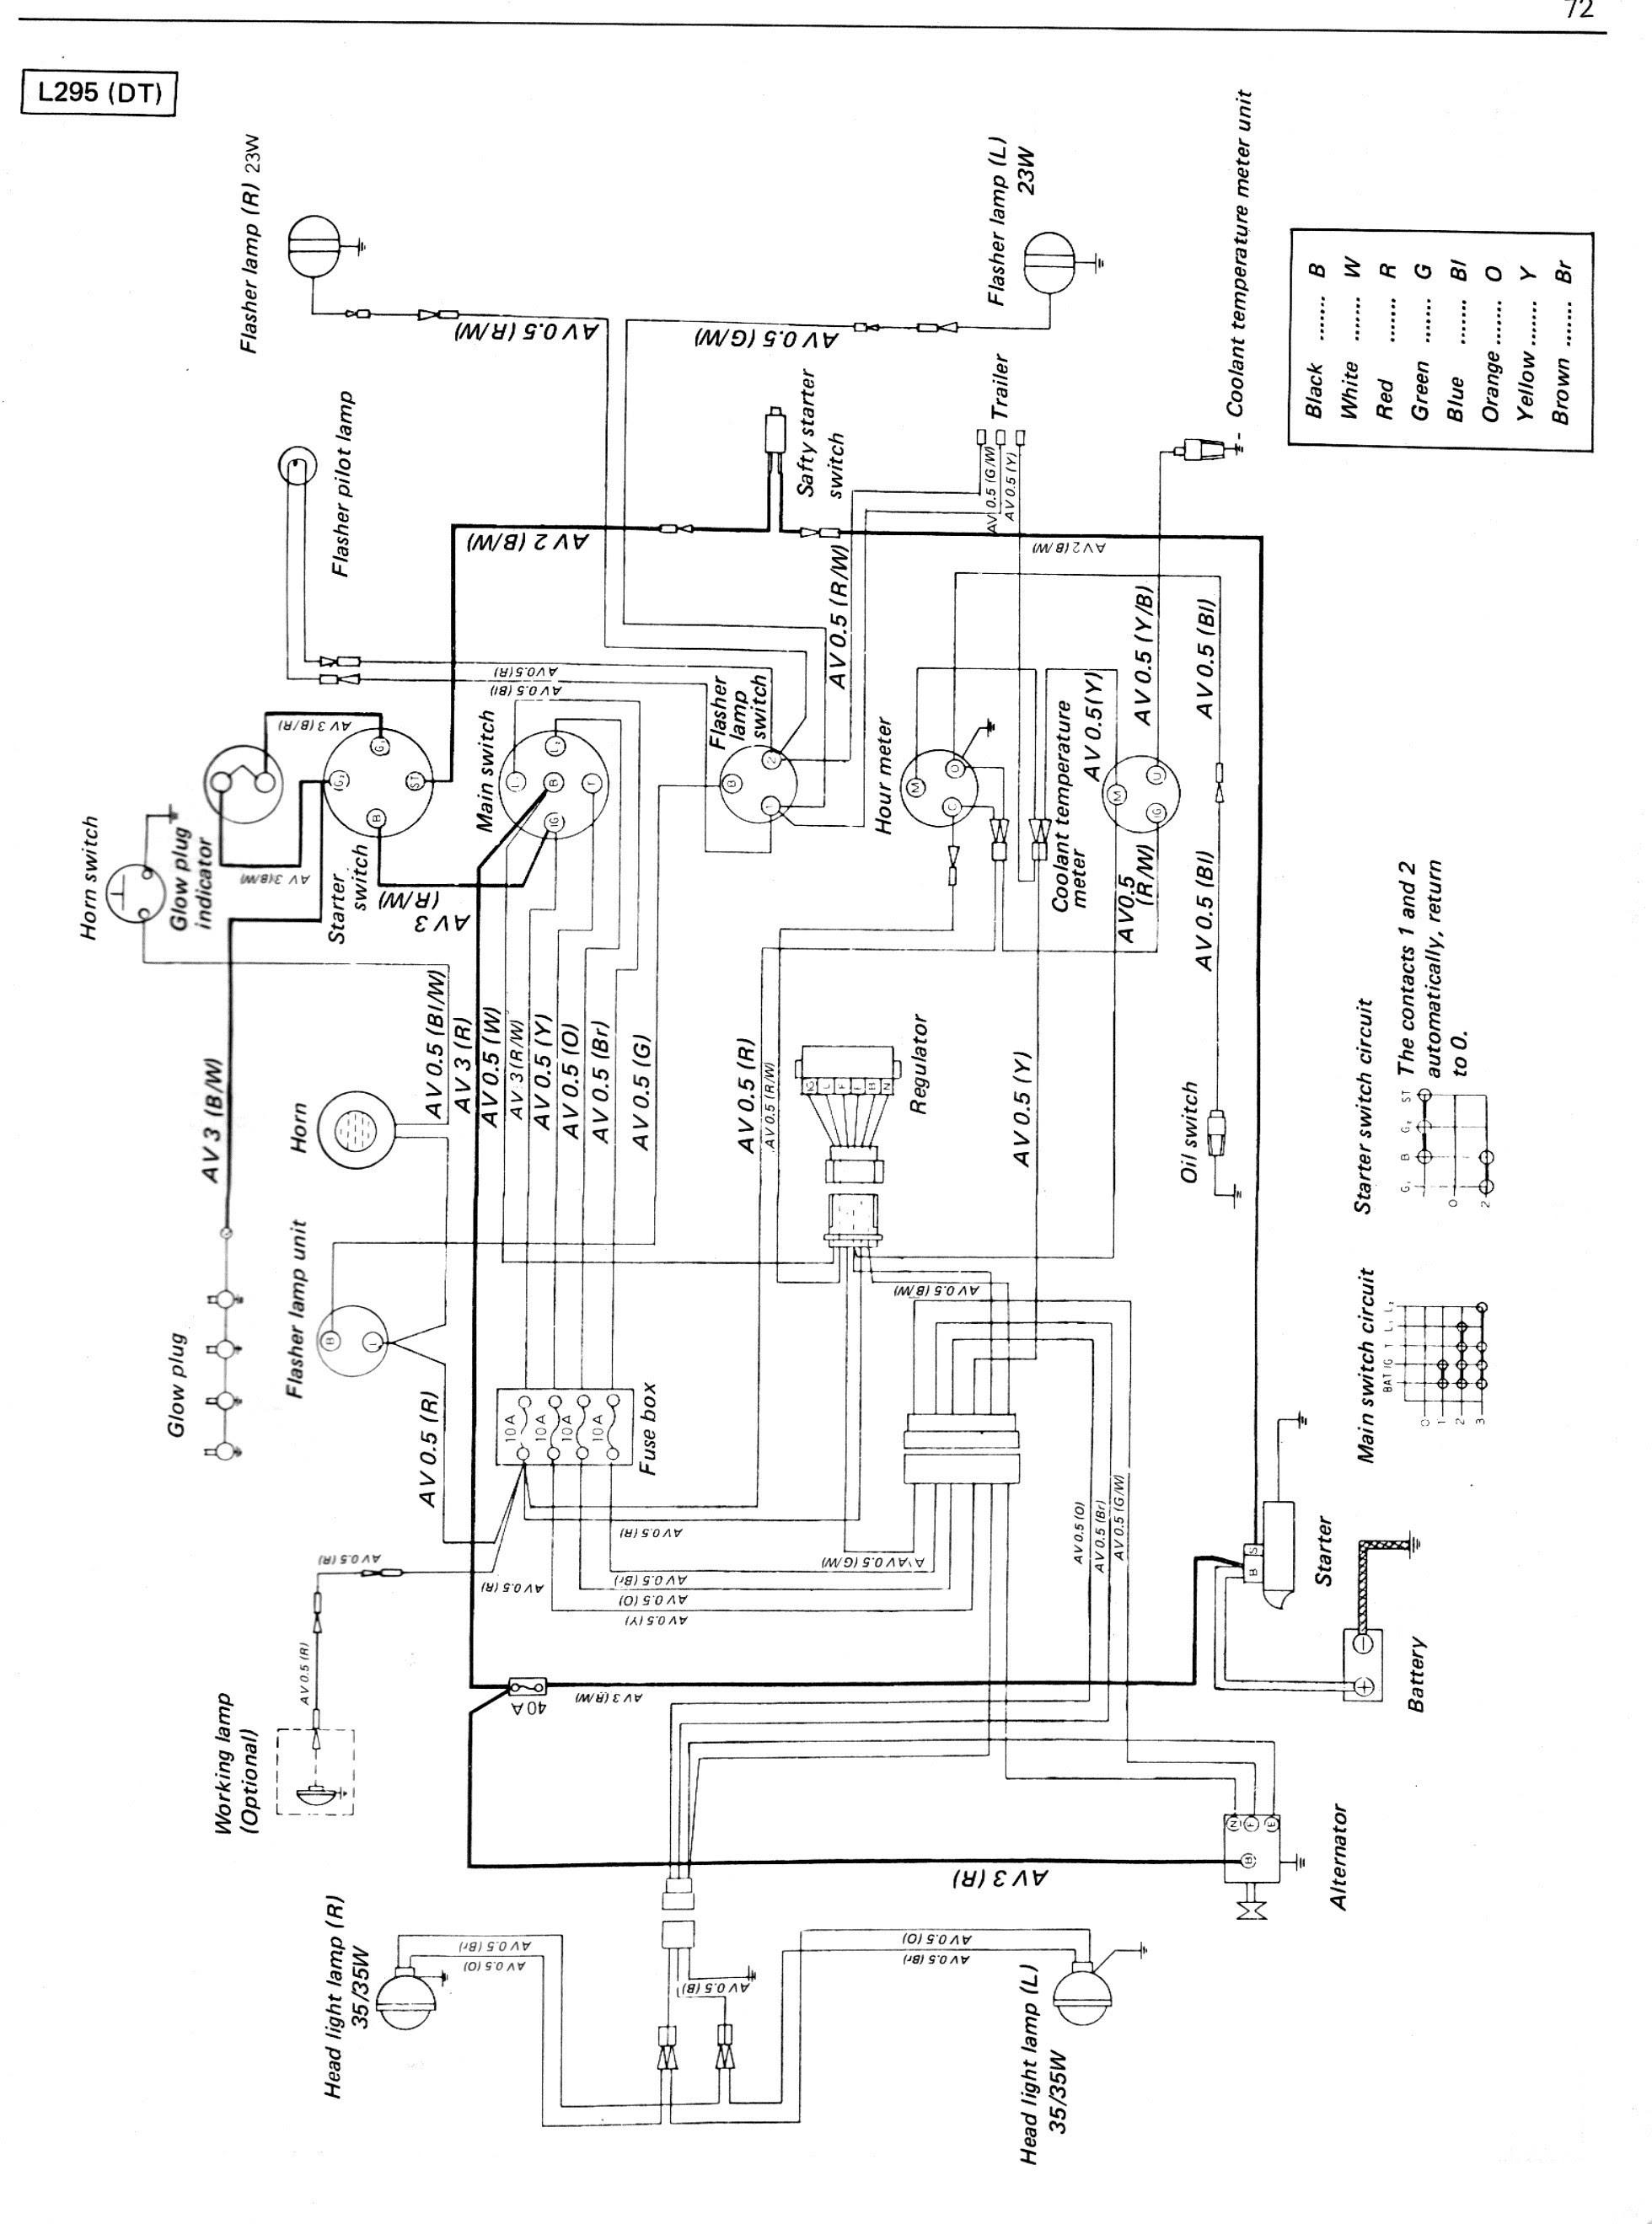 350 Wiring Diagram from lh5.googleusercontent.com